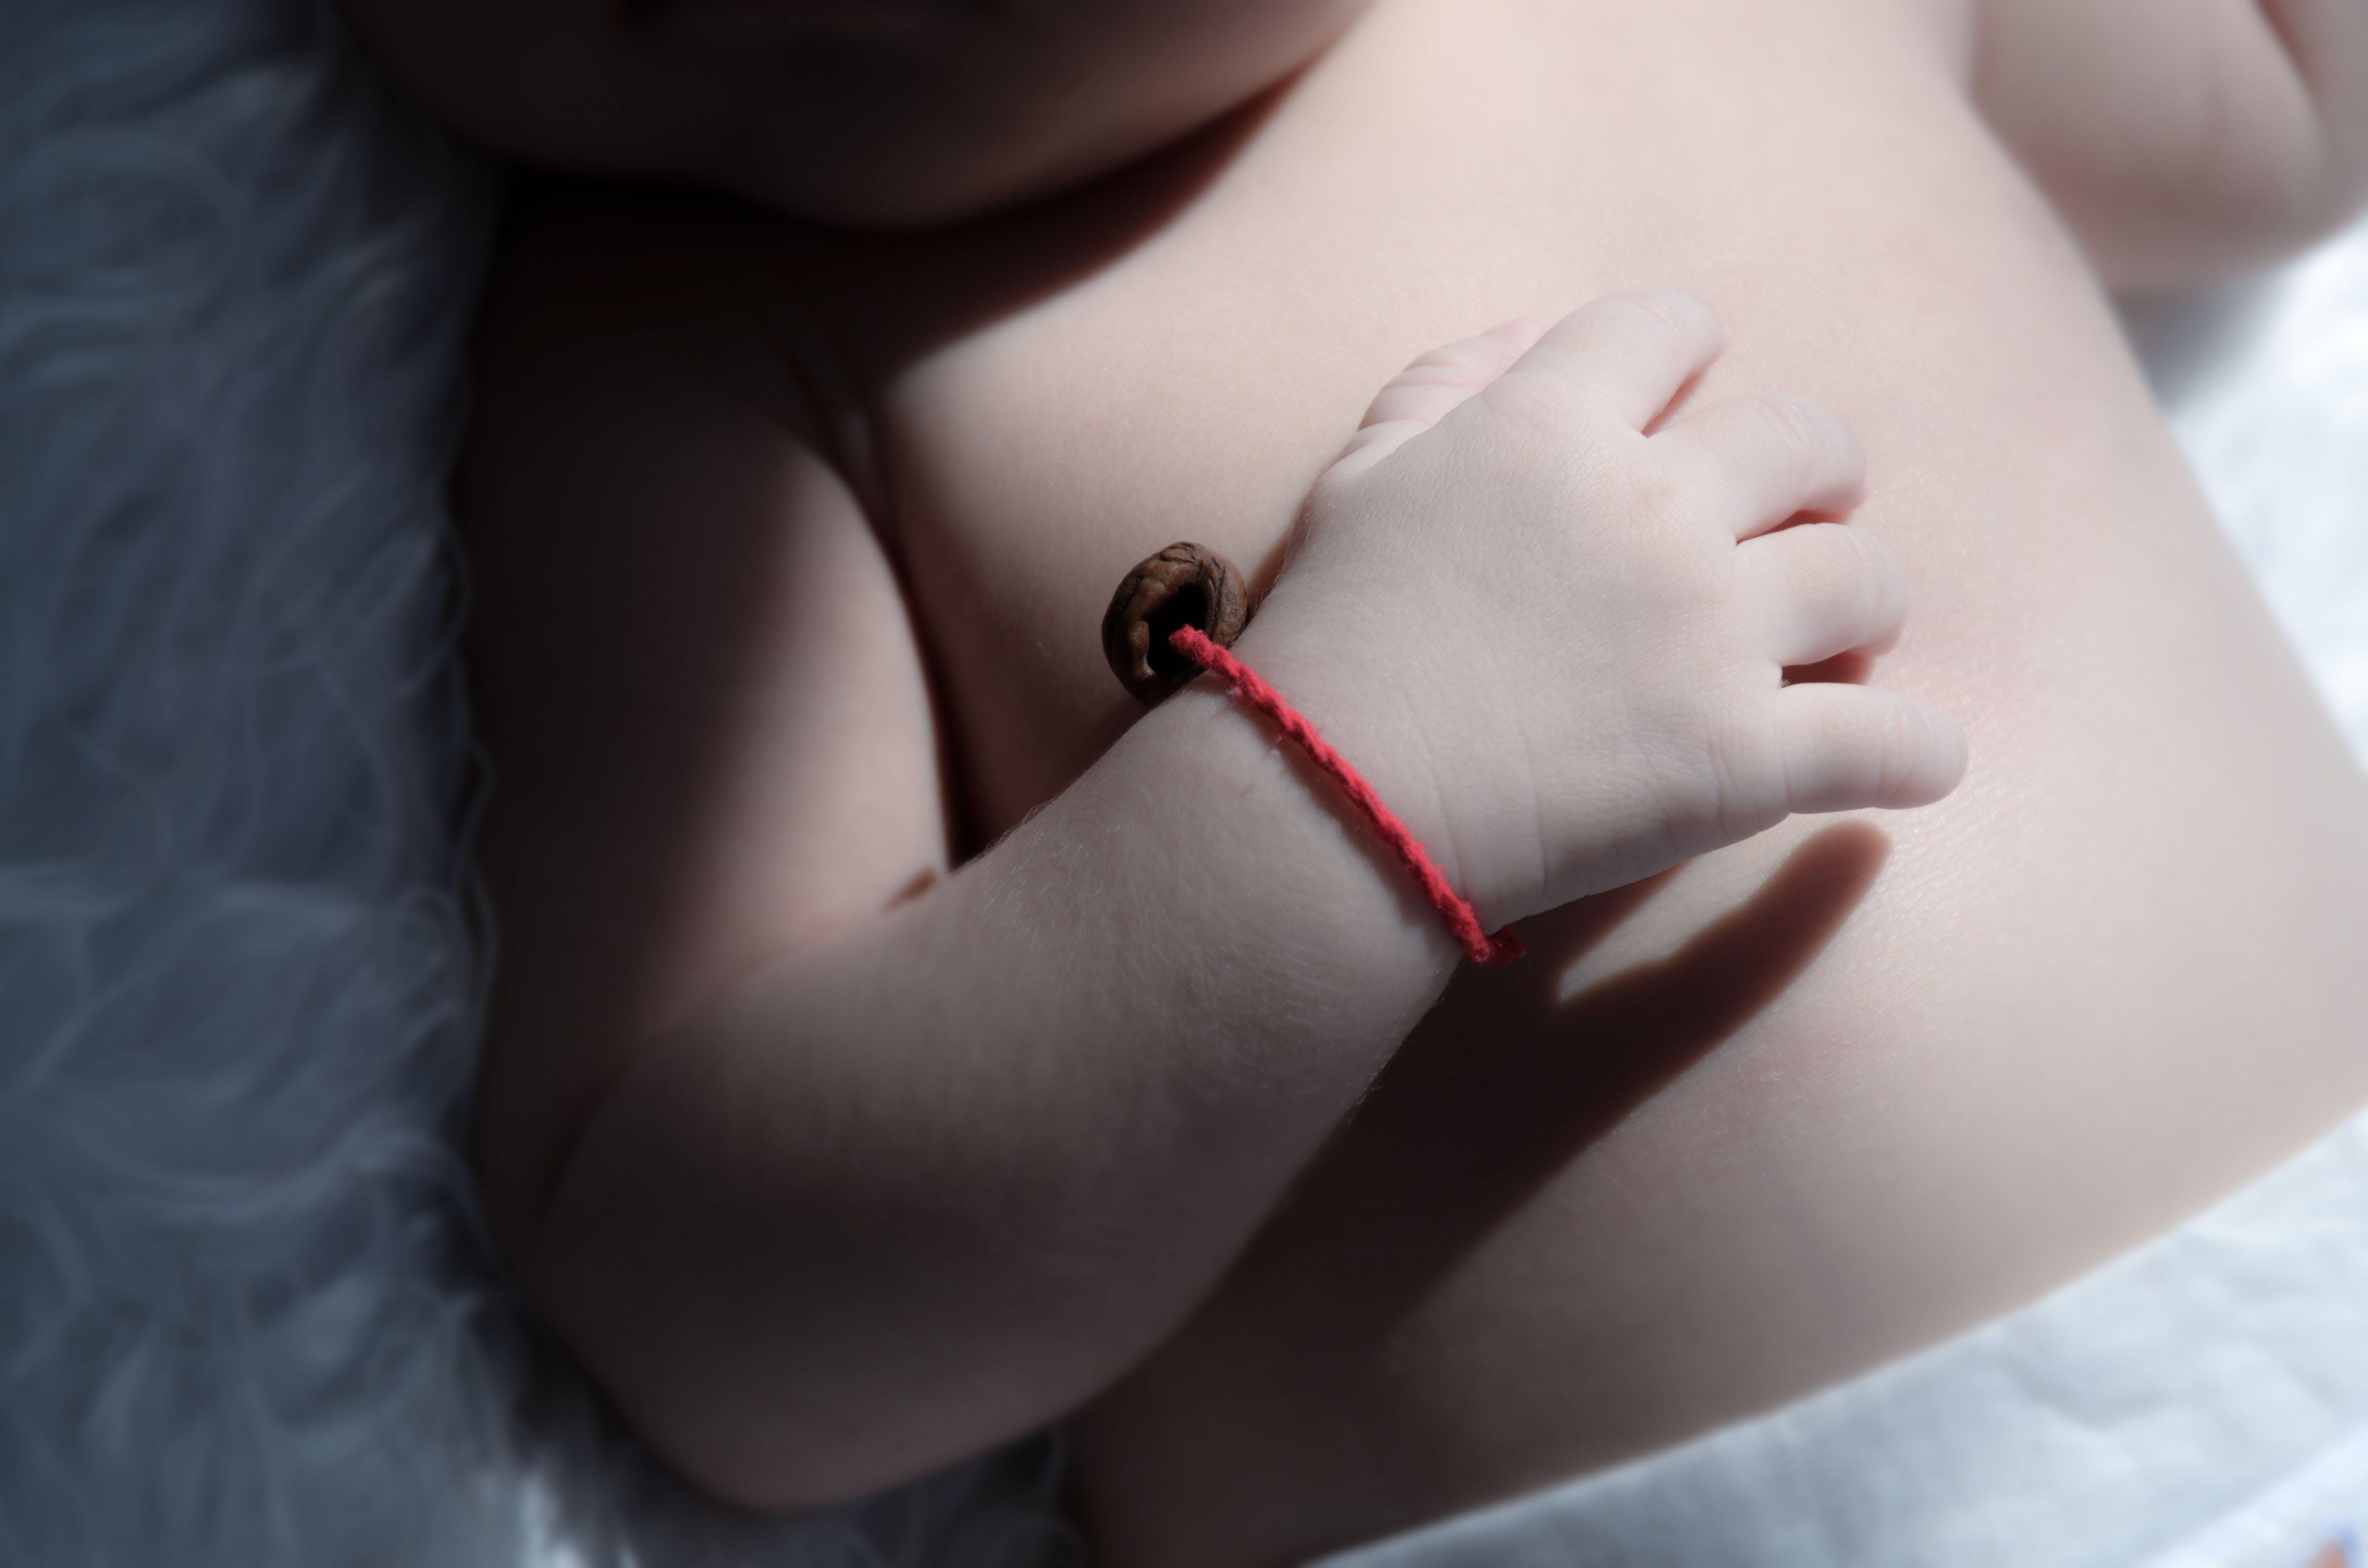 Baby Wearing Red Bracelet